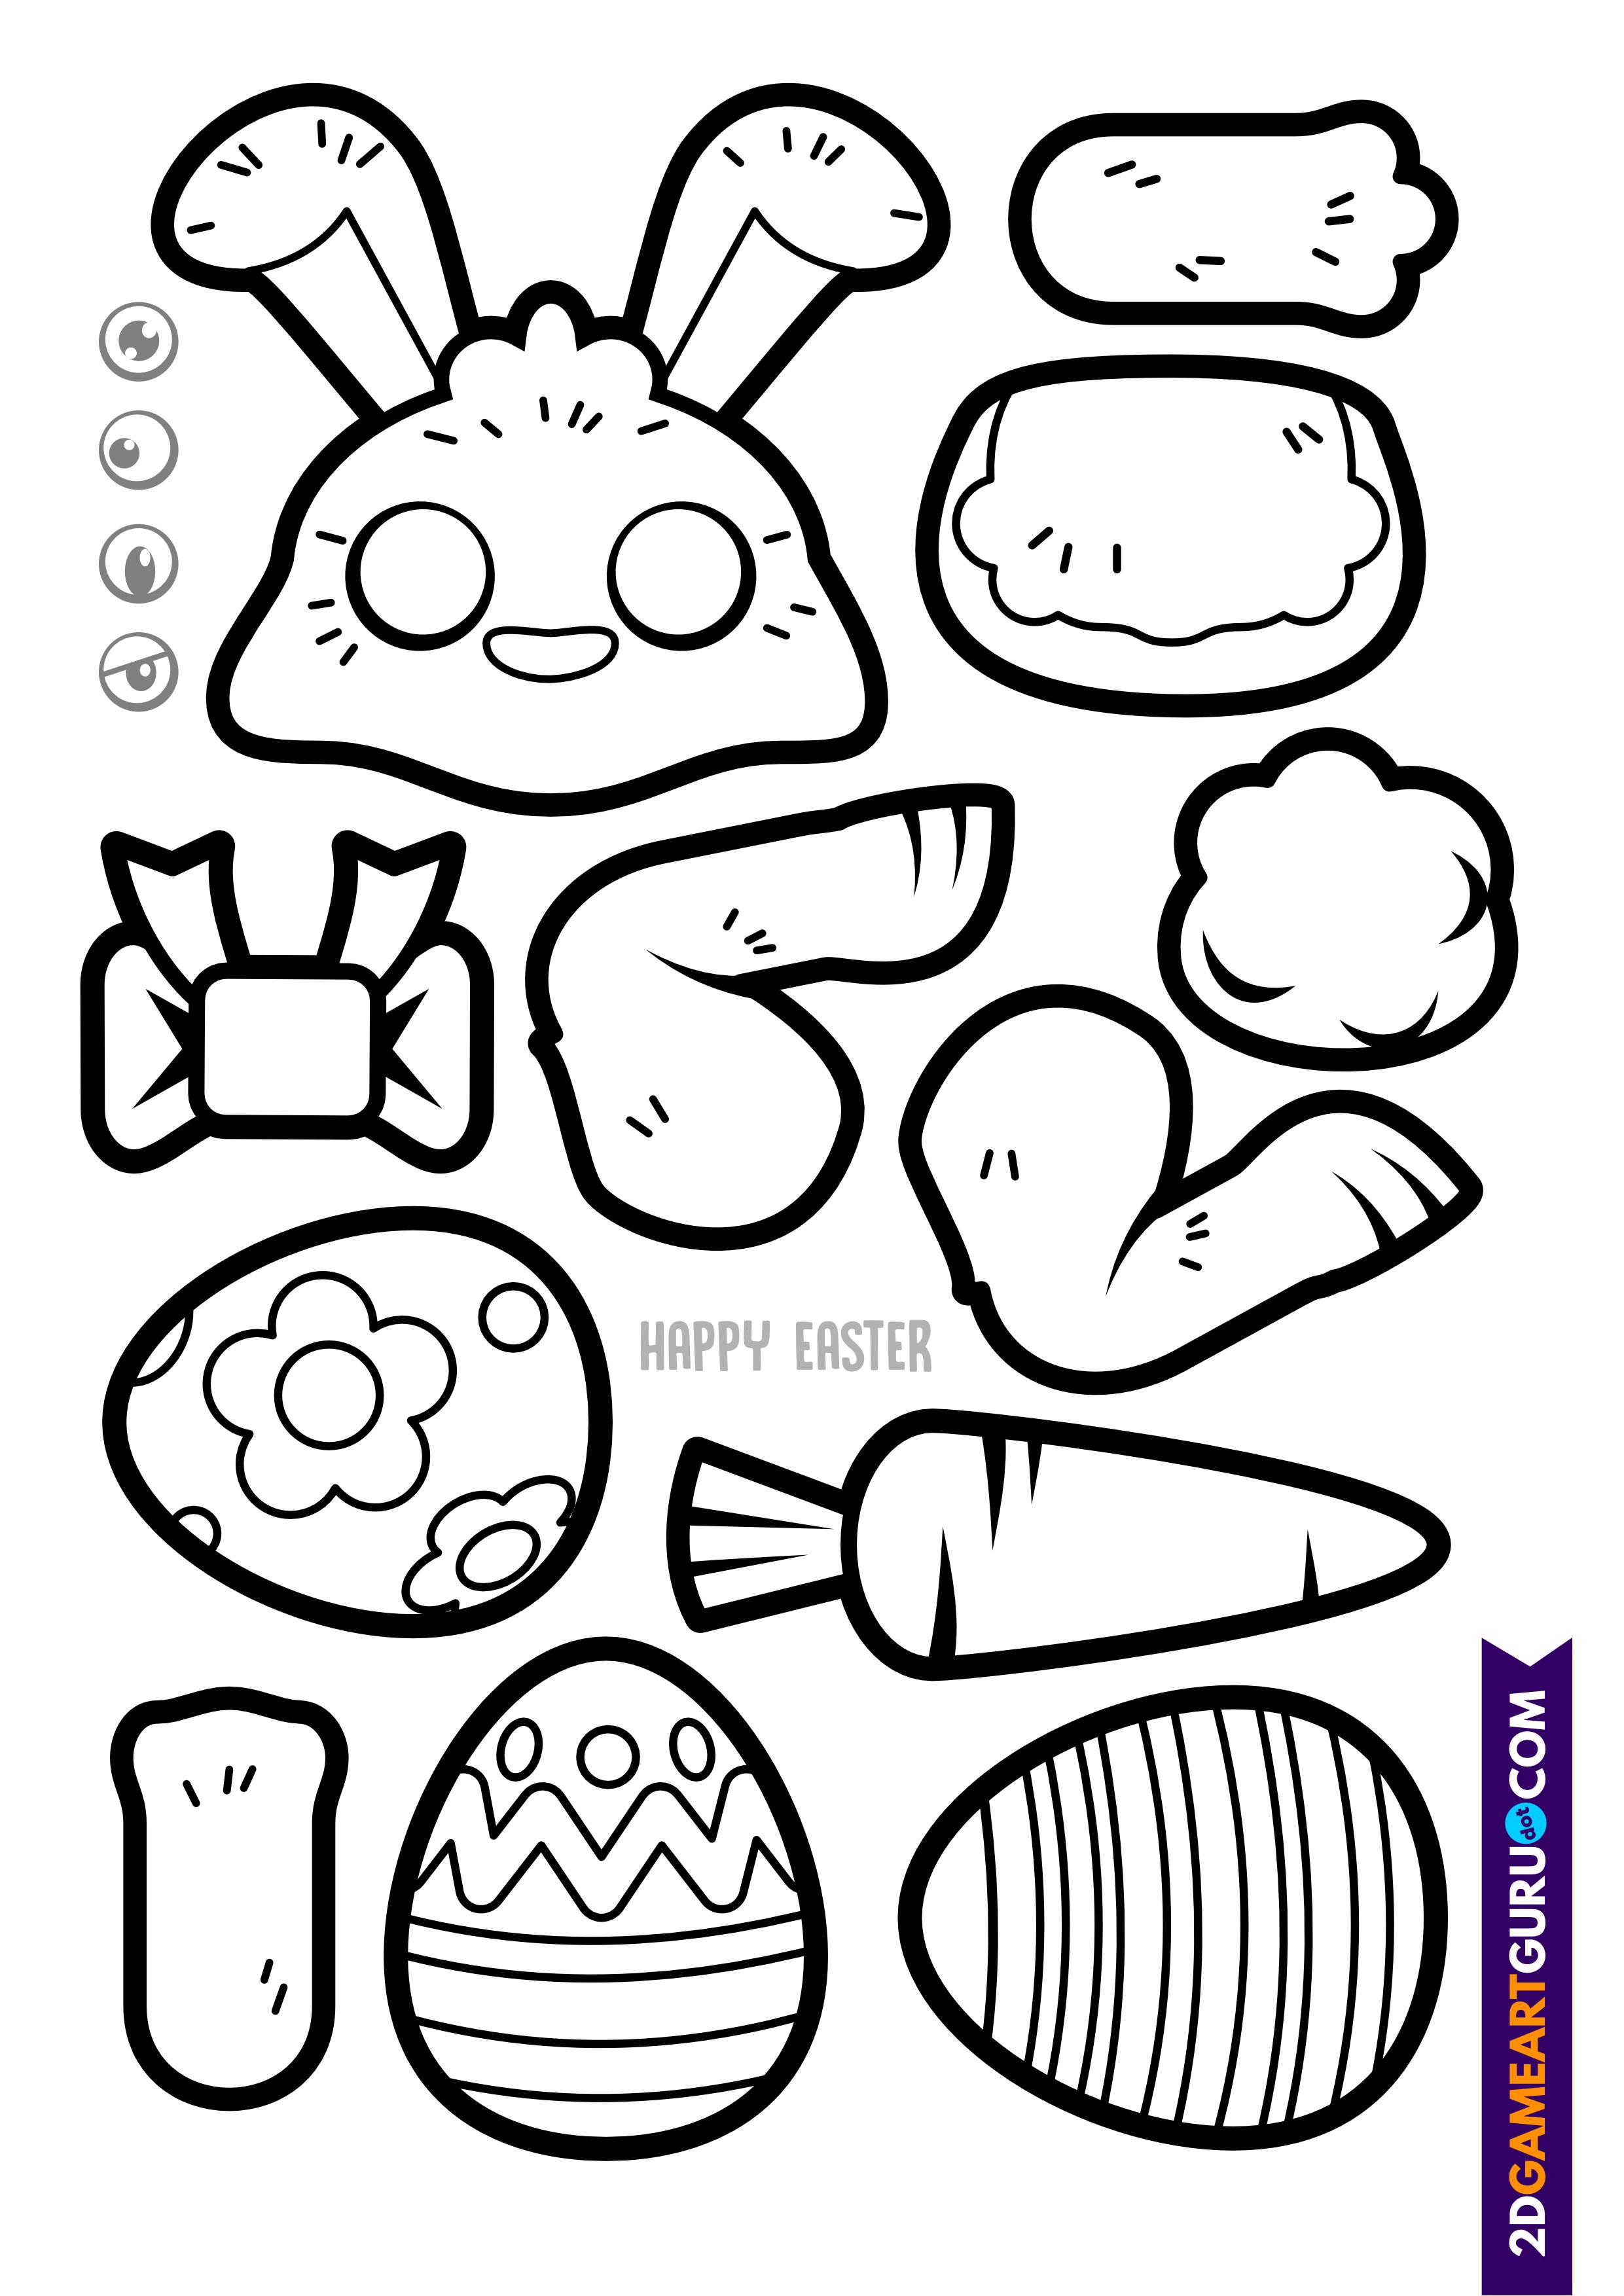 2dgameartguru - craft sheet Easter bunny